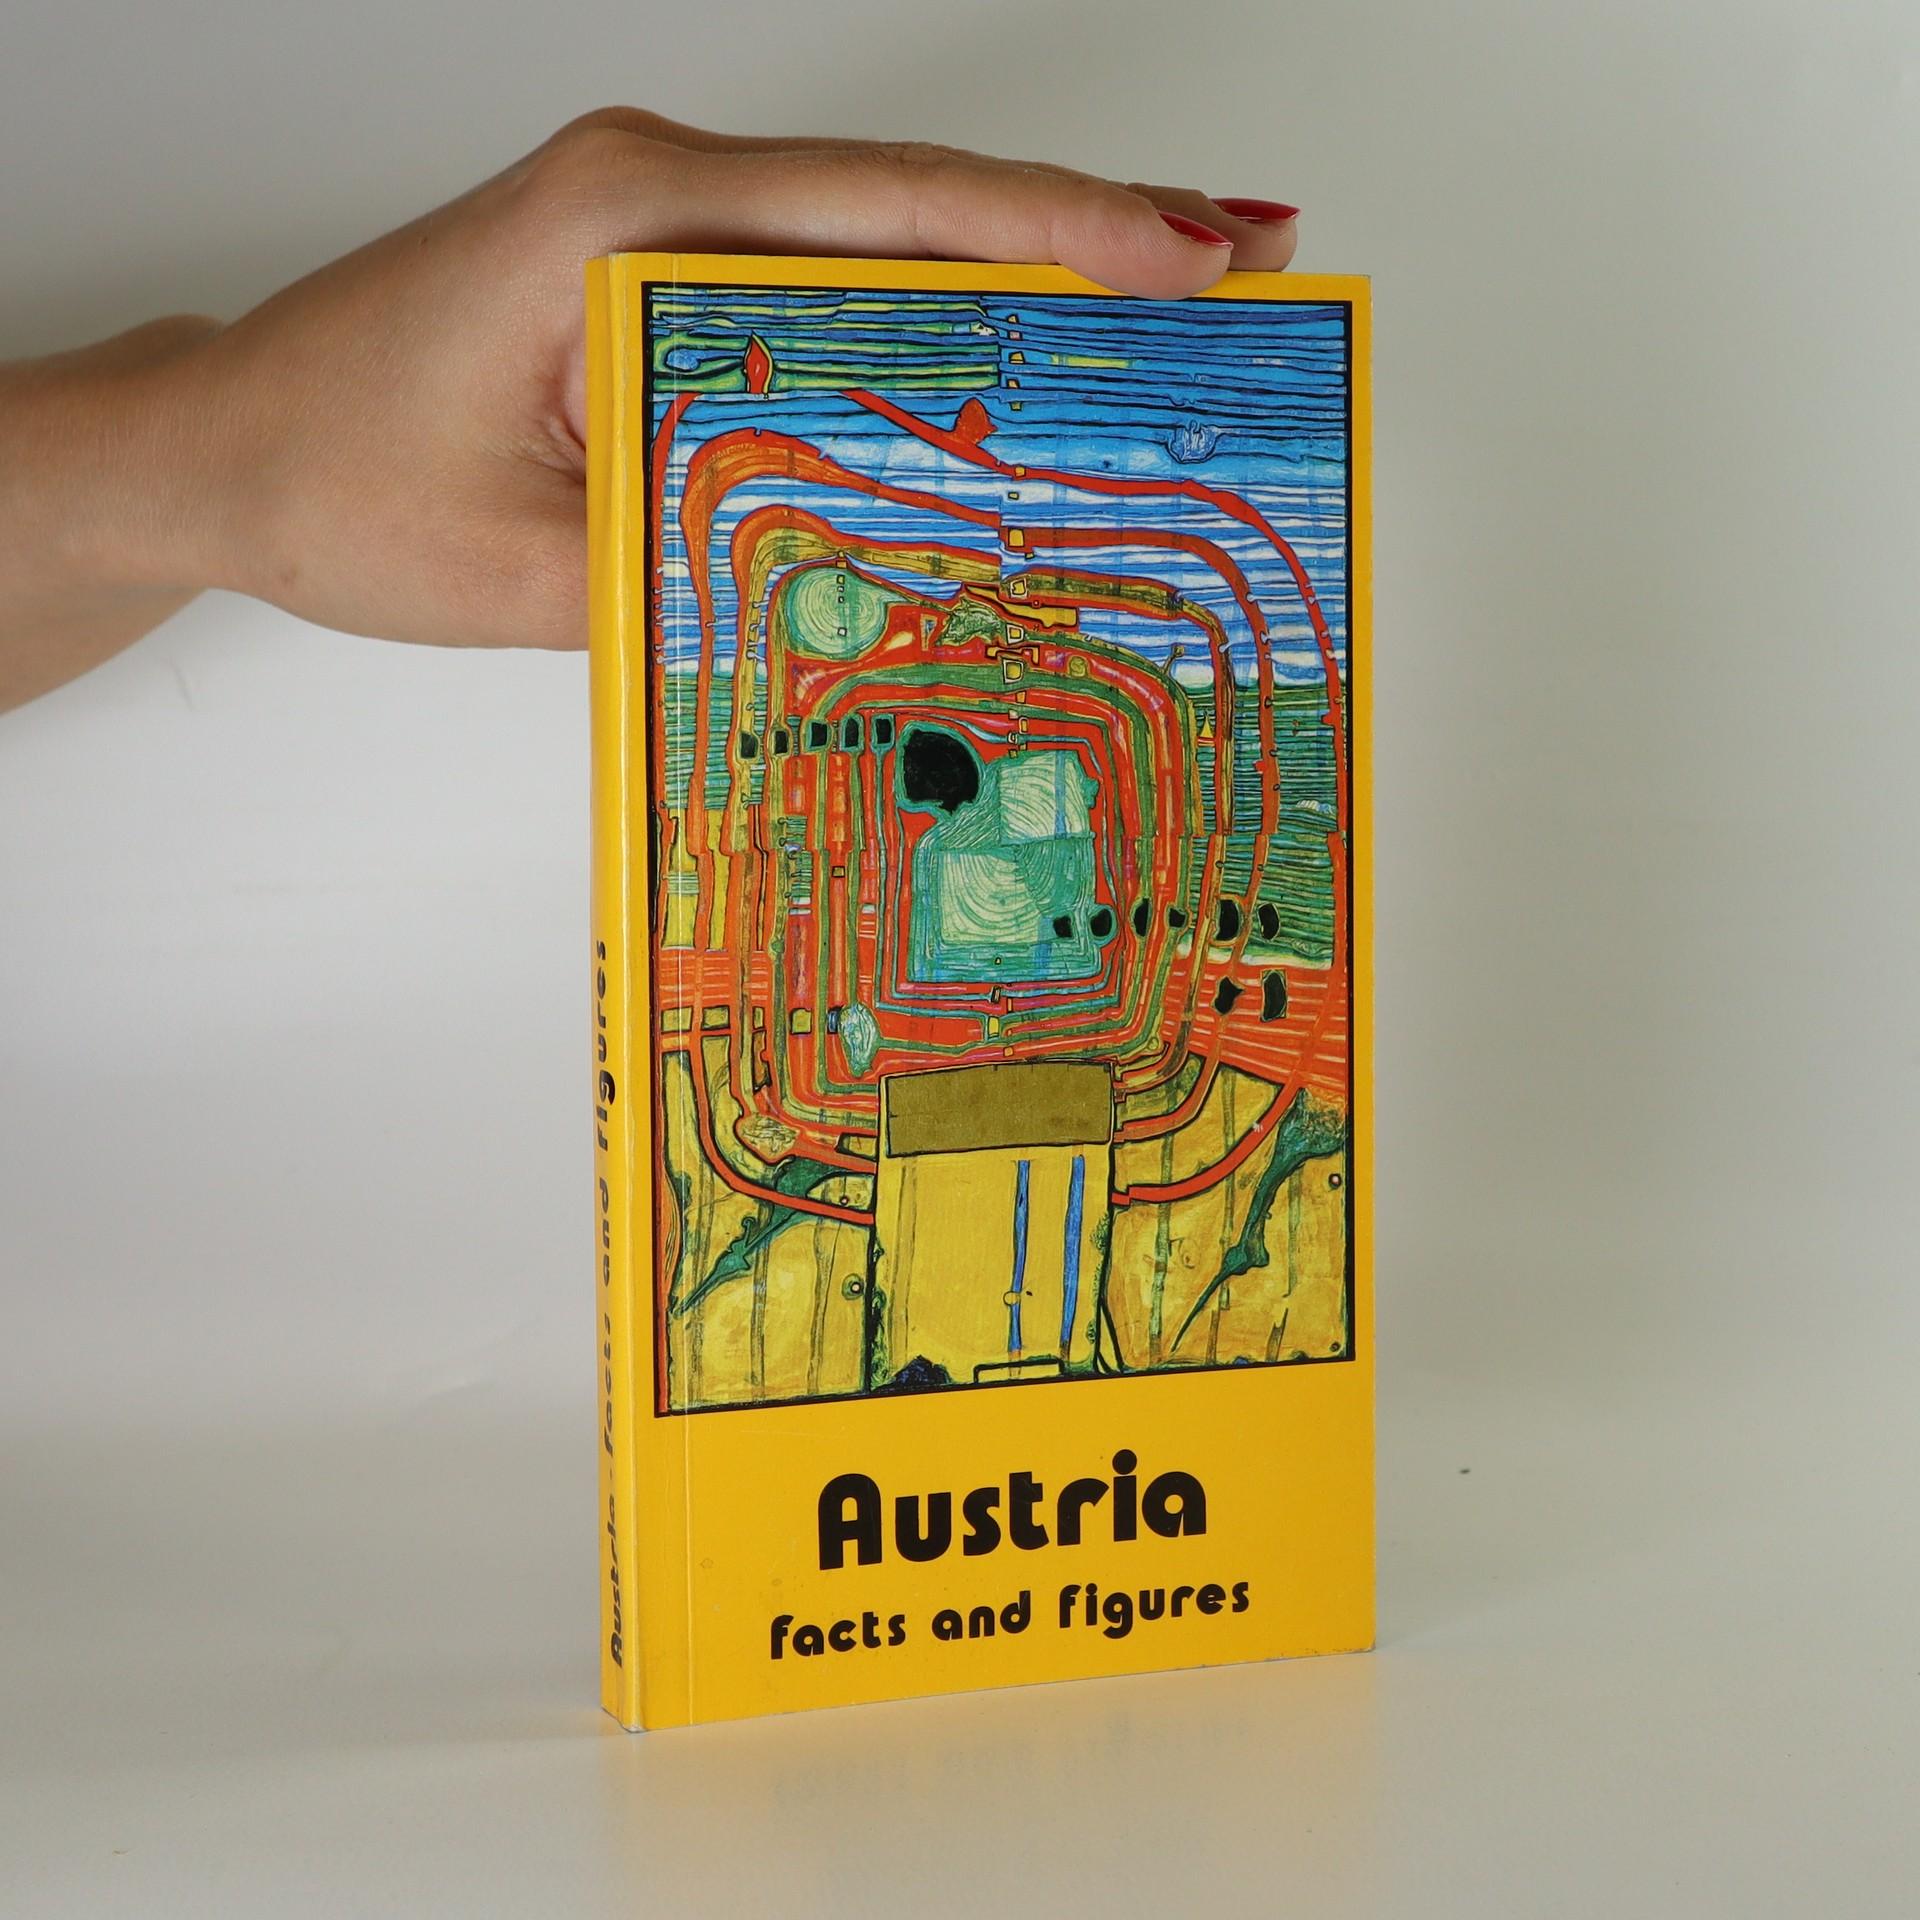 antikvární kniha Austria facts and figures, 1973